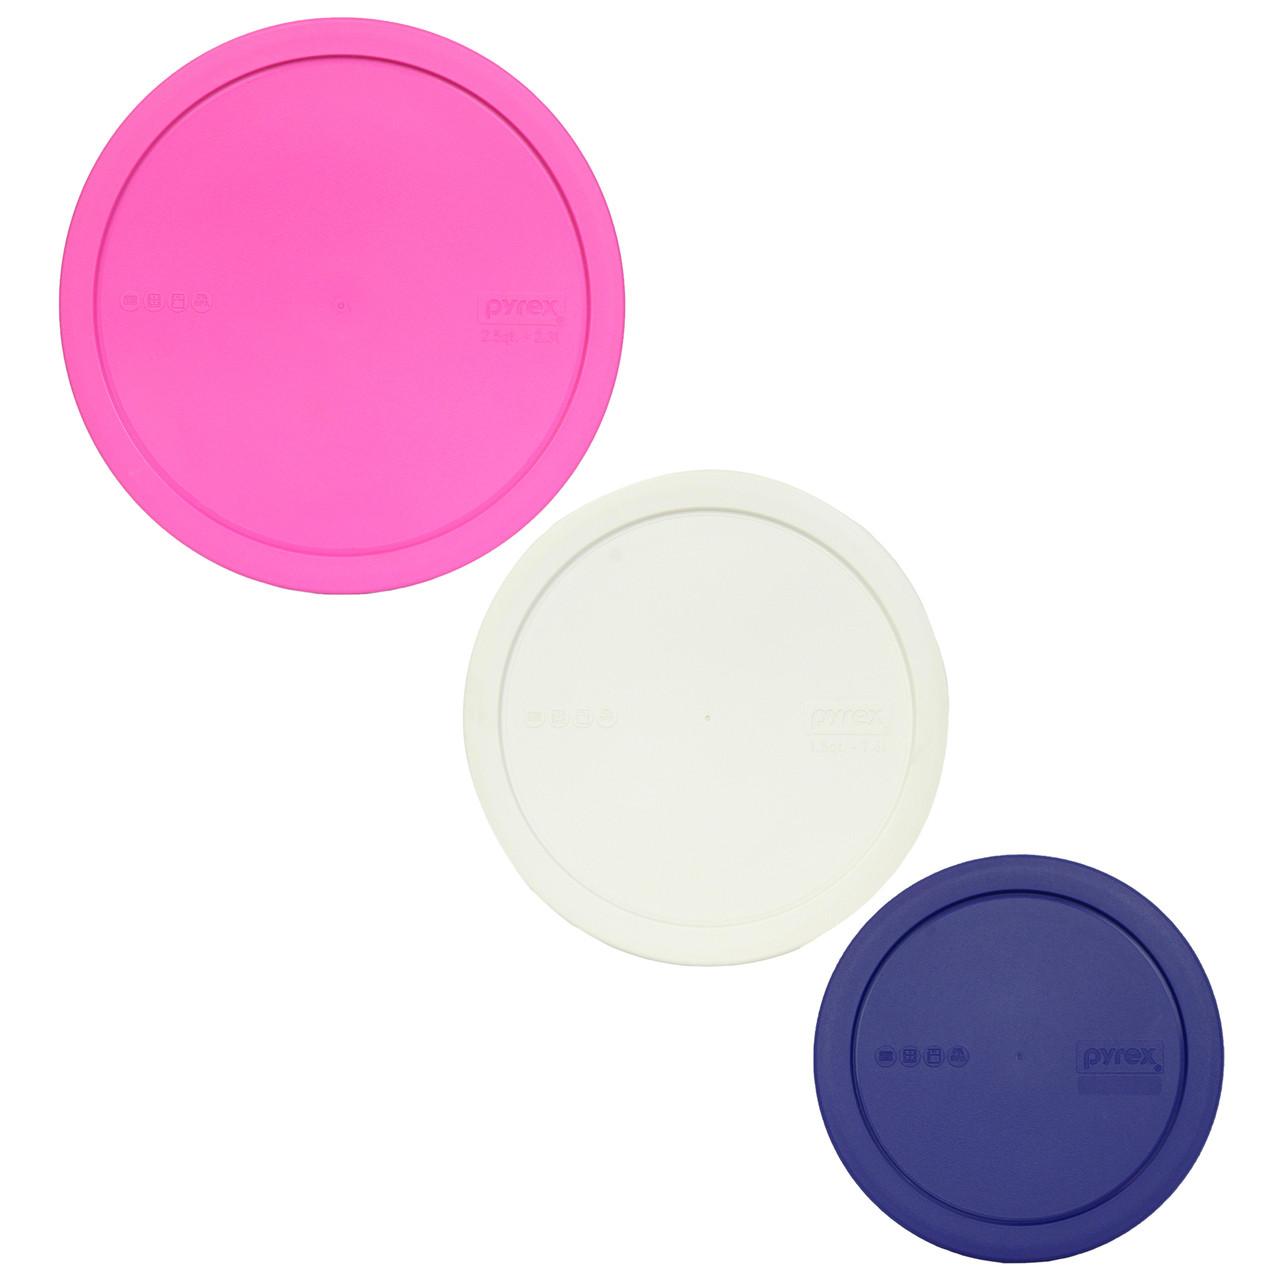 2 Pack Pyrex 323-PC 1.5 Quart White Round Plastic Mixing Bowl Lid